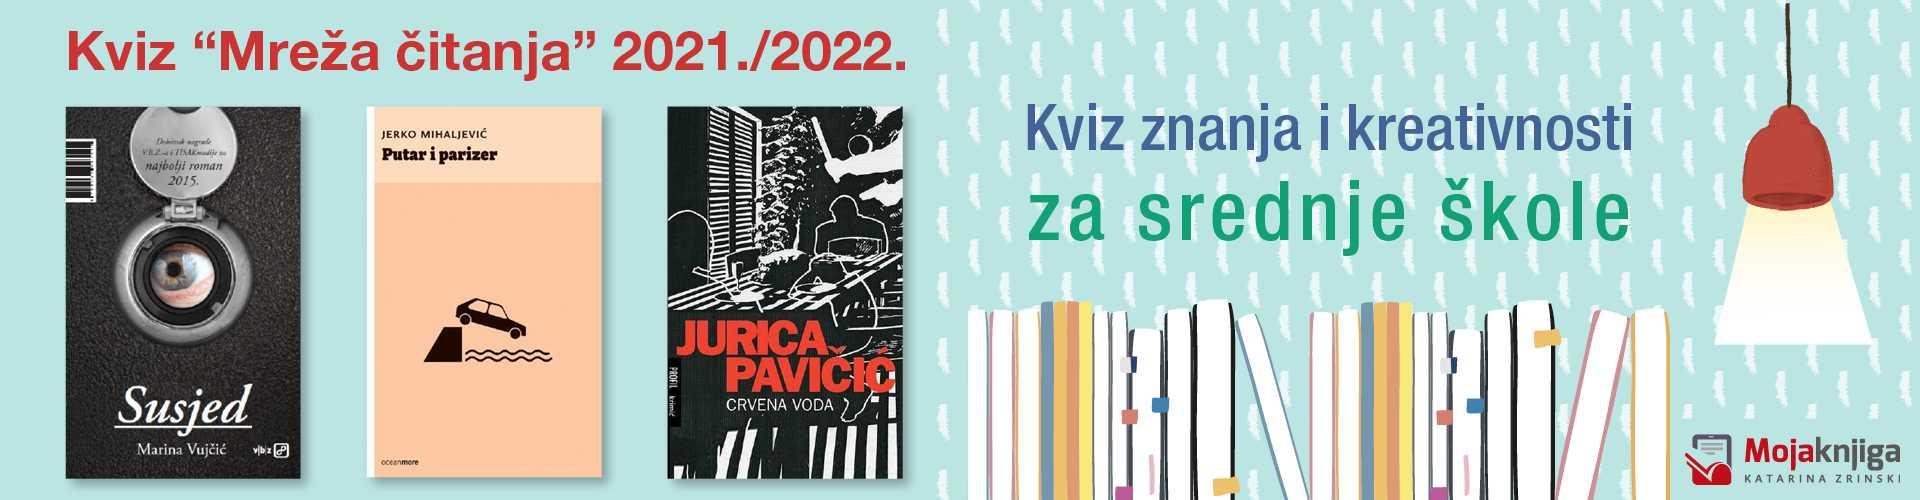 Mreza citanja_SS_2021-2022_1920-500